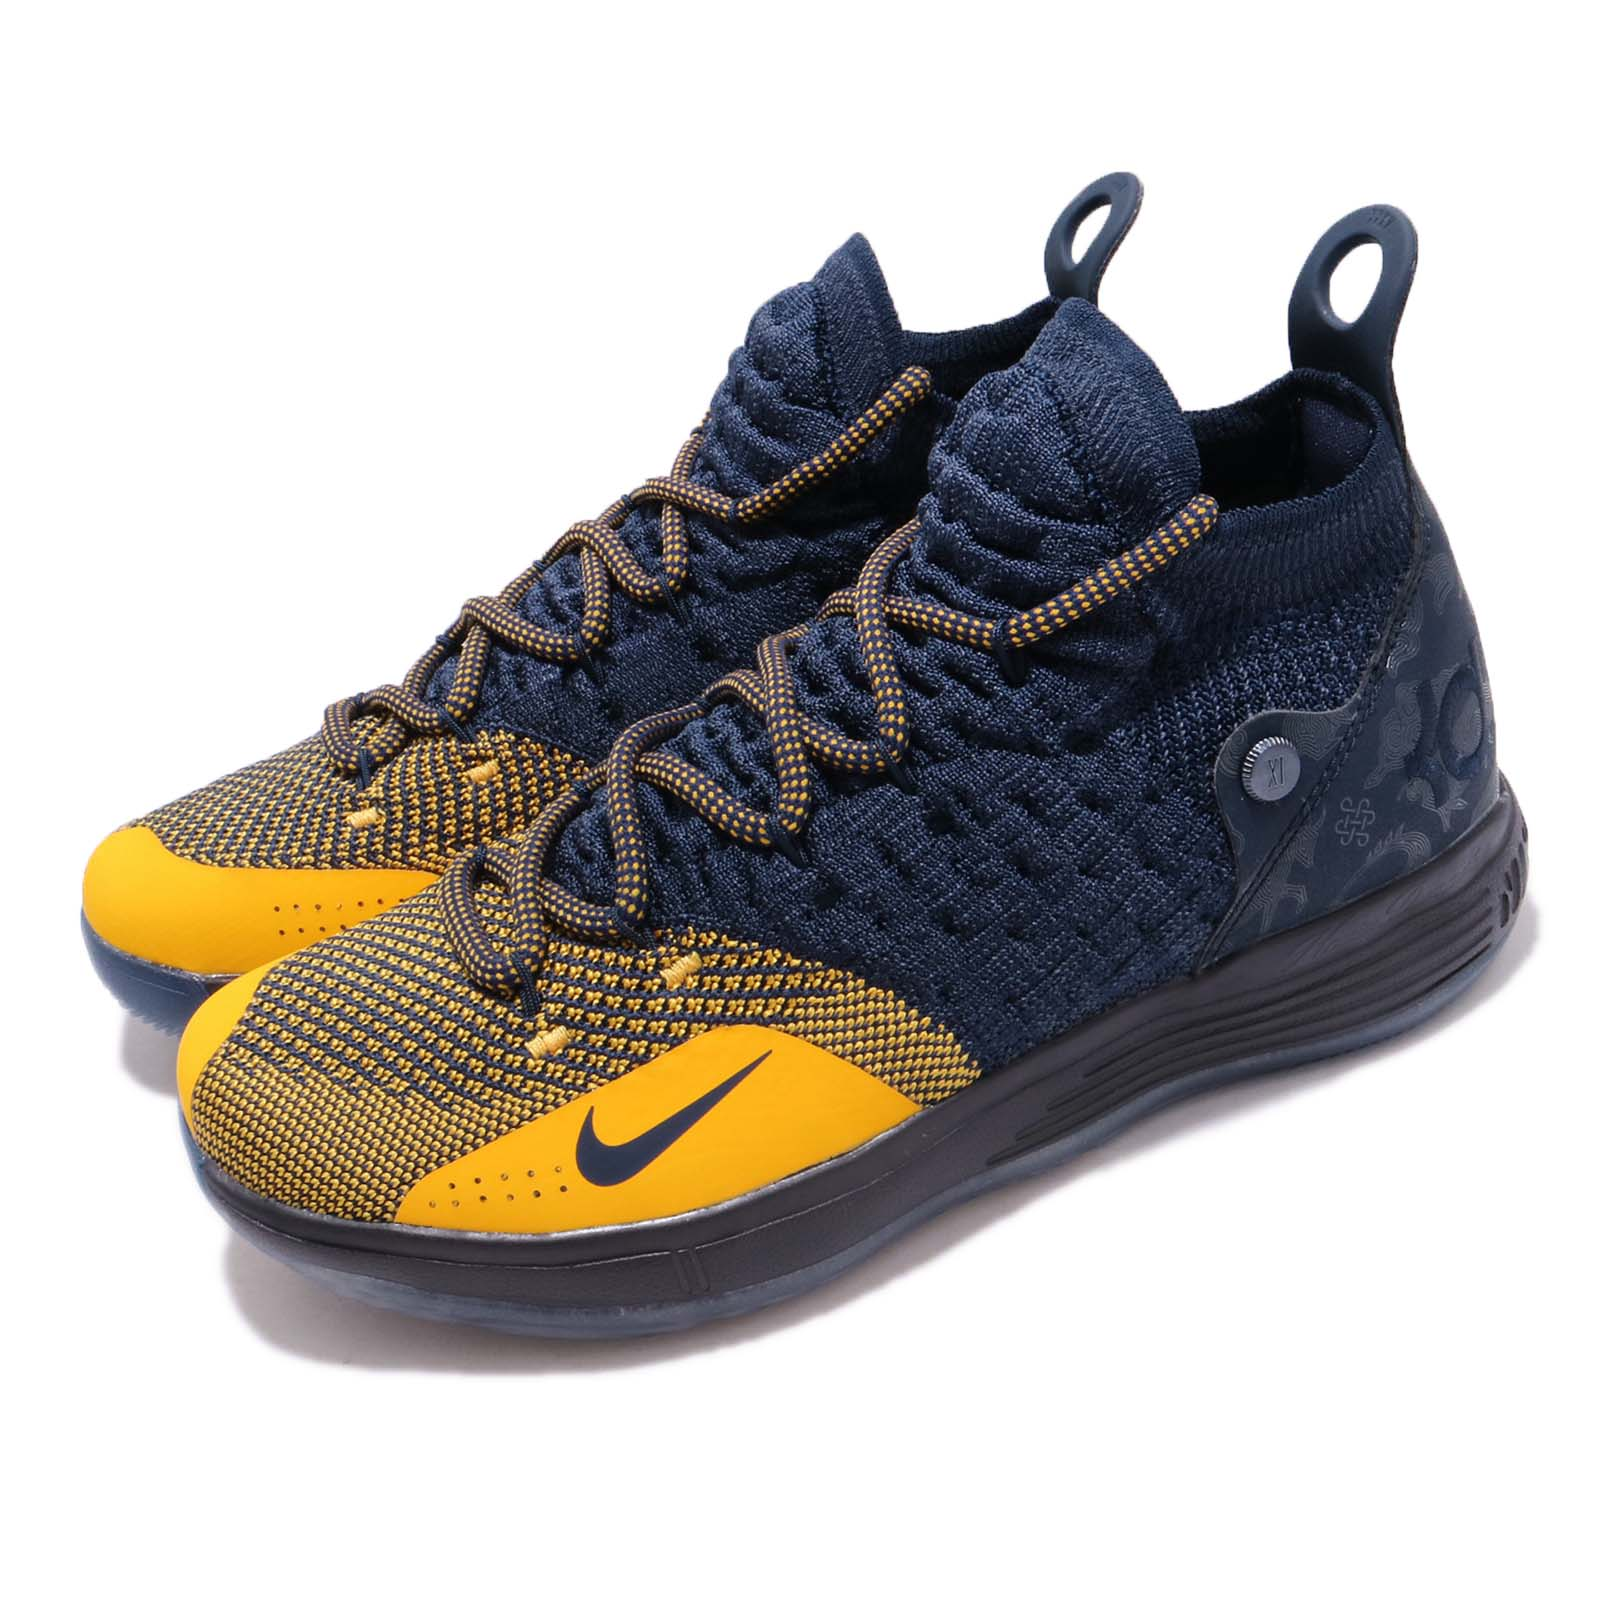 Nike 籃球鞋 KD 11 襪套 運動 女鞋 AH3465-400